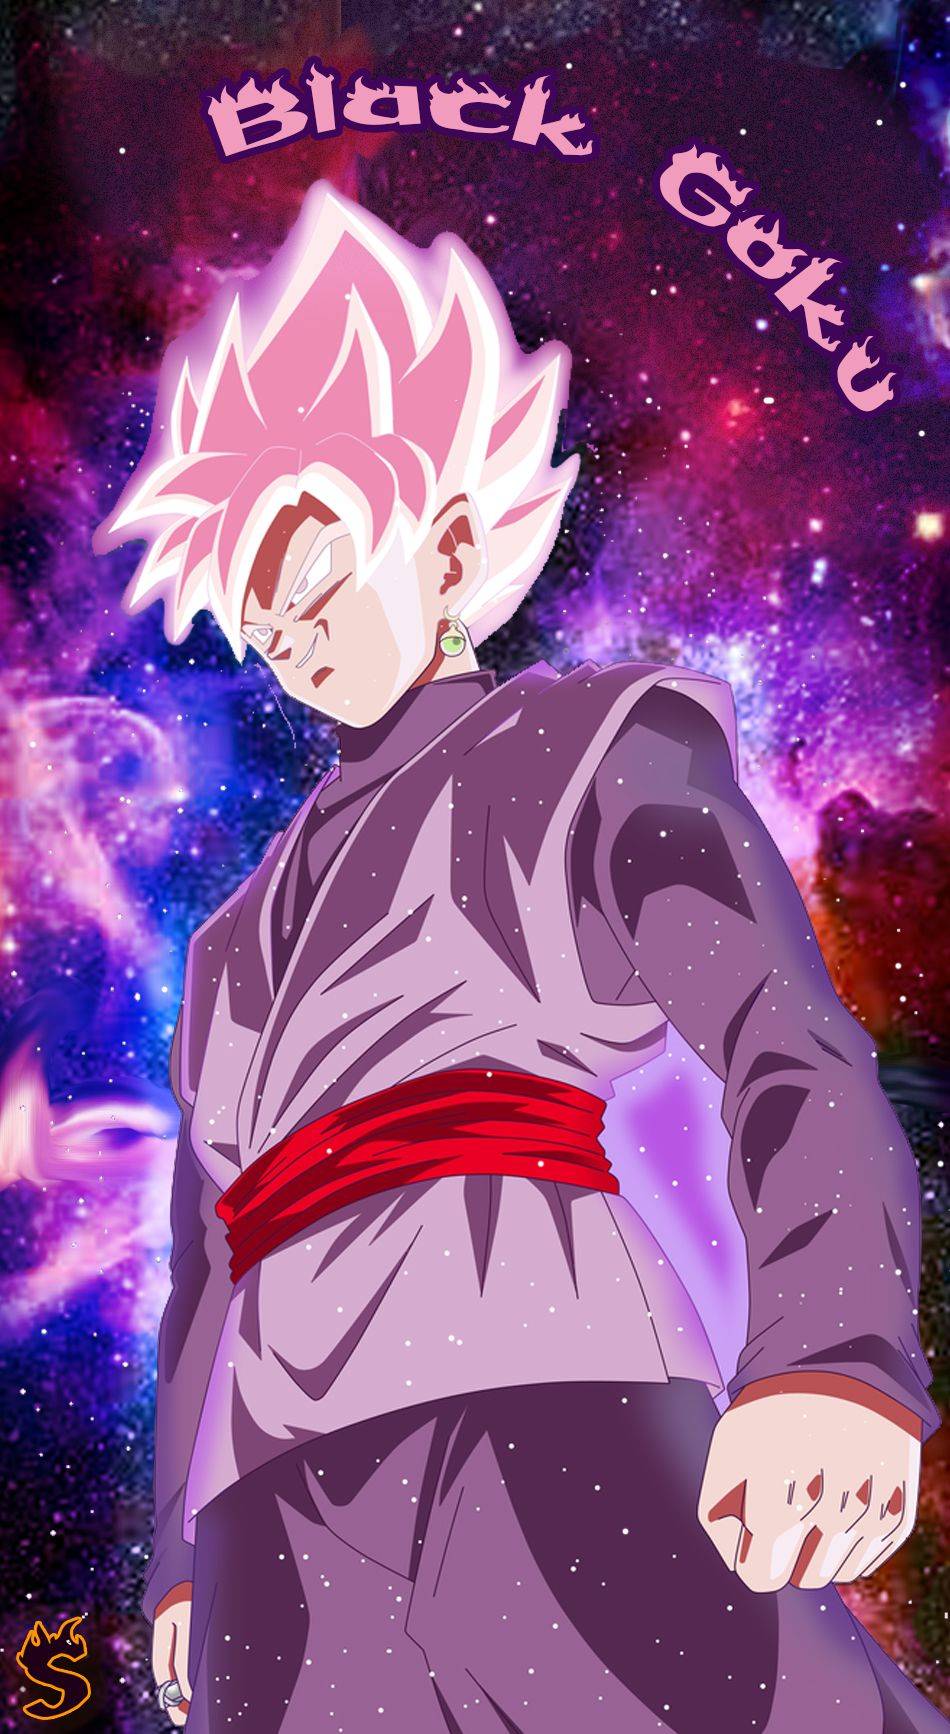 Black Goku Live Wallpapers Top Free Black Goku Live Backgrounds Wallpaperaccess